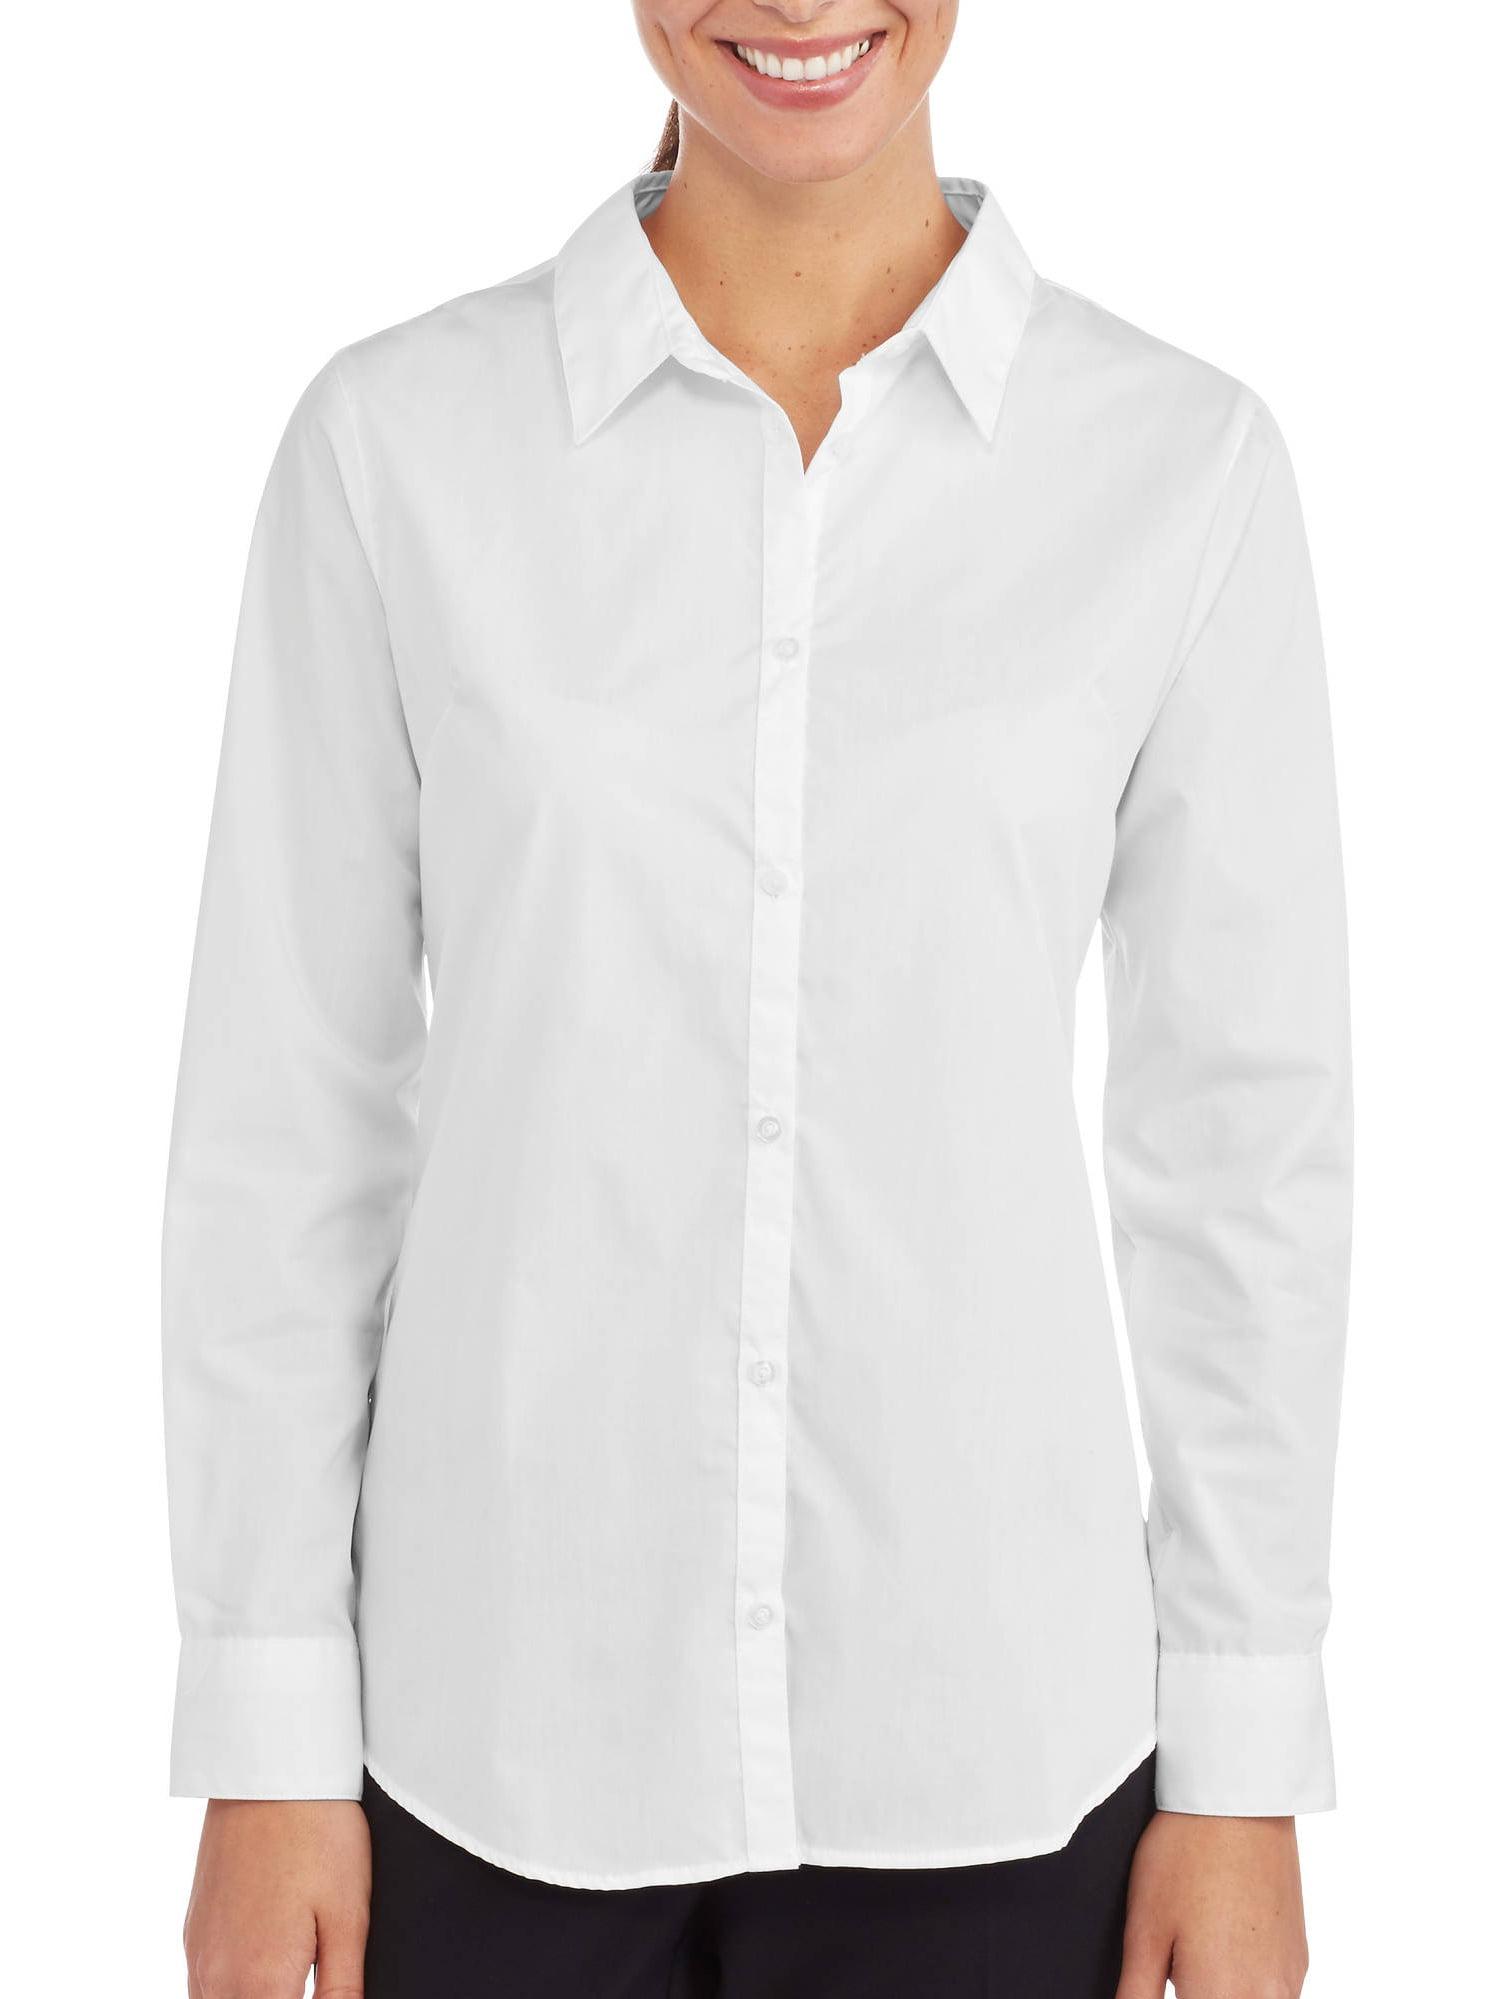 5e4c76a6924973 George Womens Career Essentials Short Sleeve Button Down Shirt ...